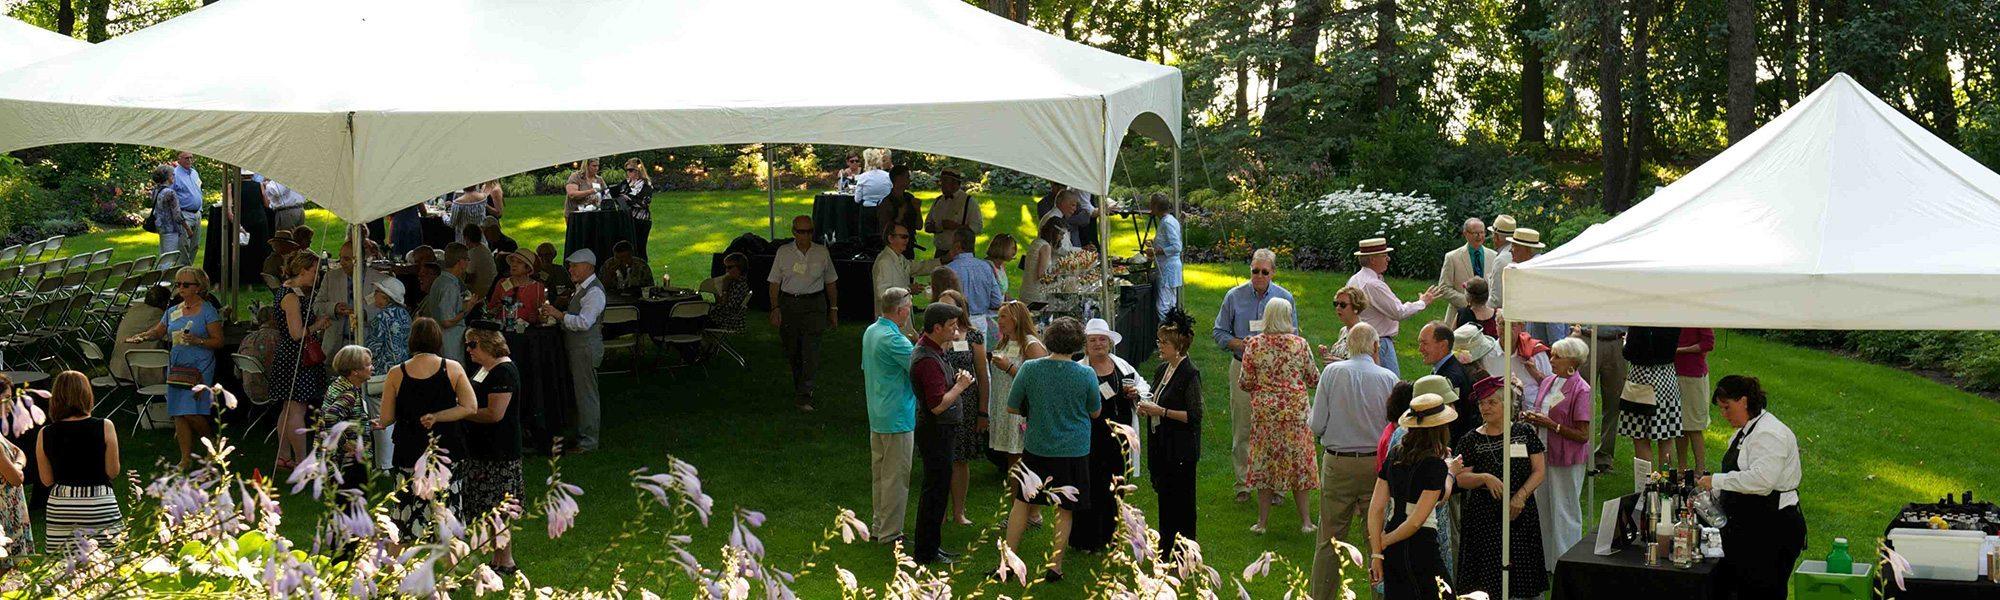 Wedding Event Organized by Annplans